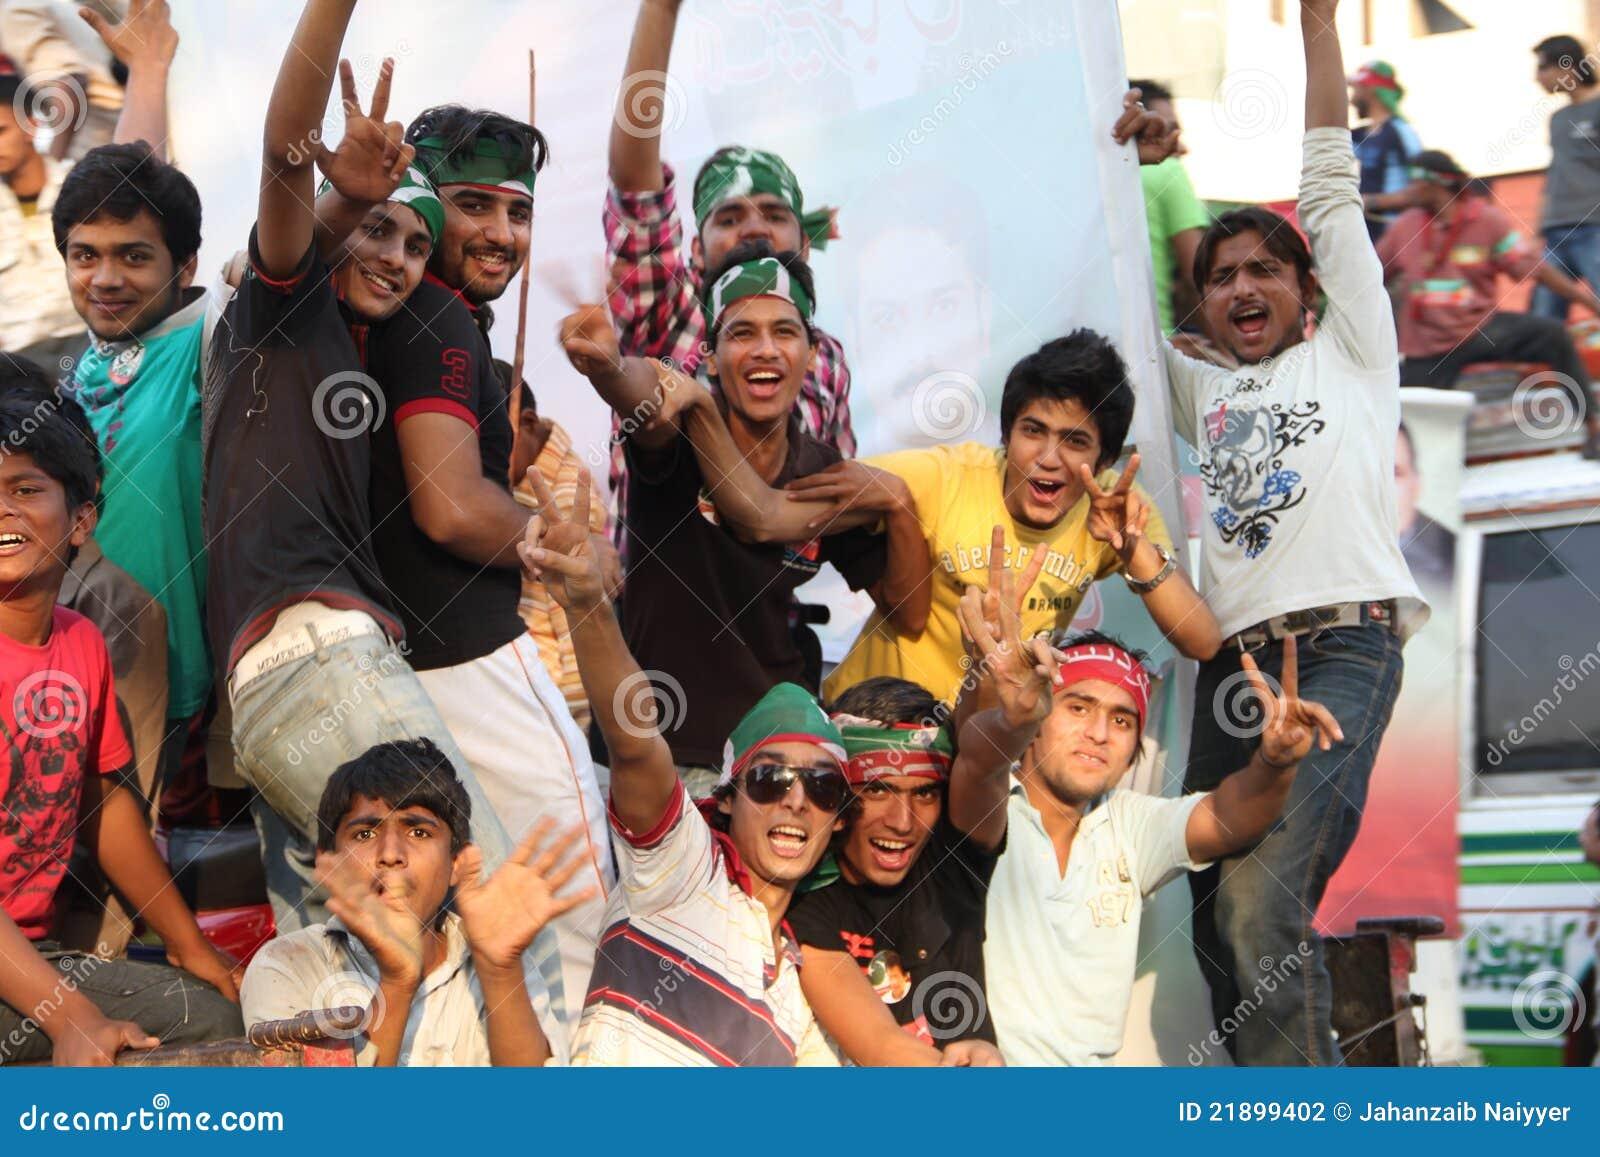 Imran khan pti支持者年轻人